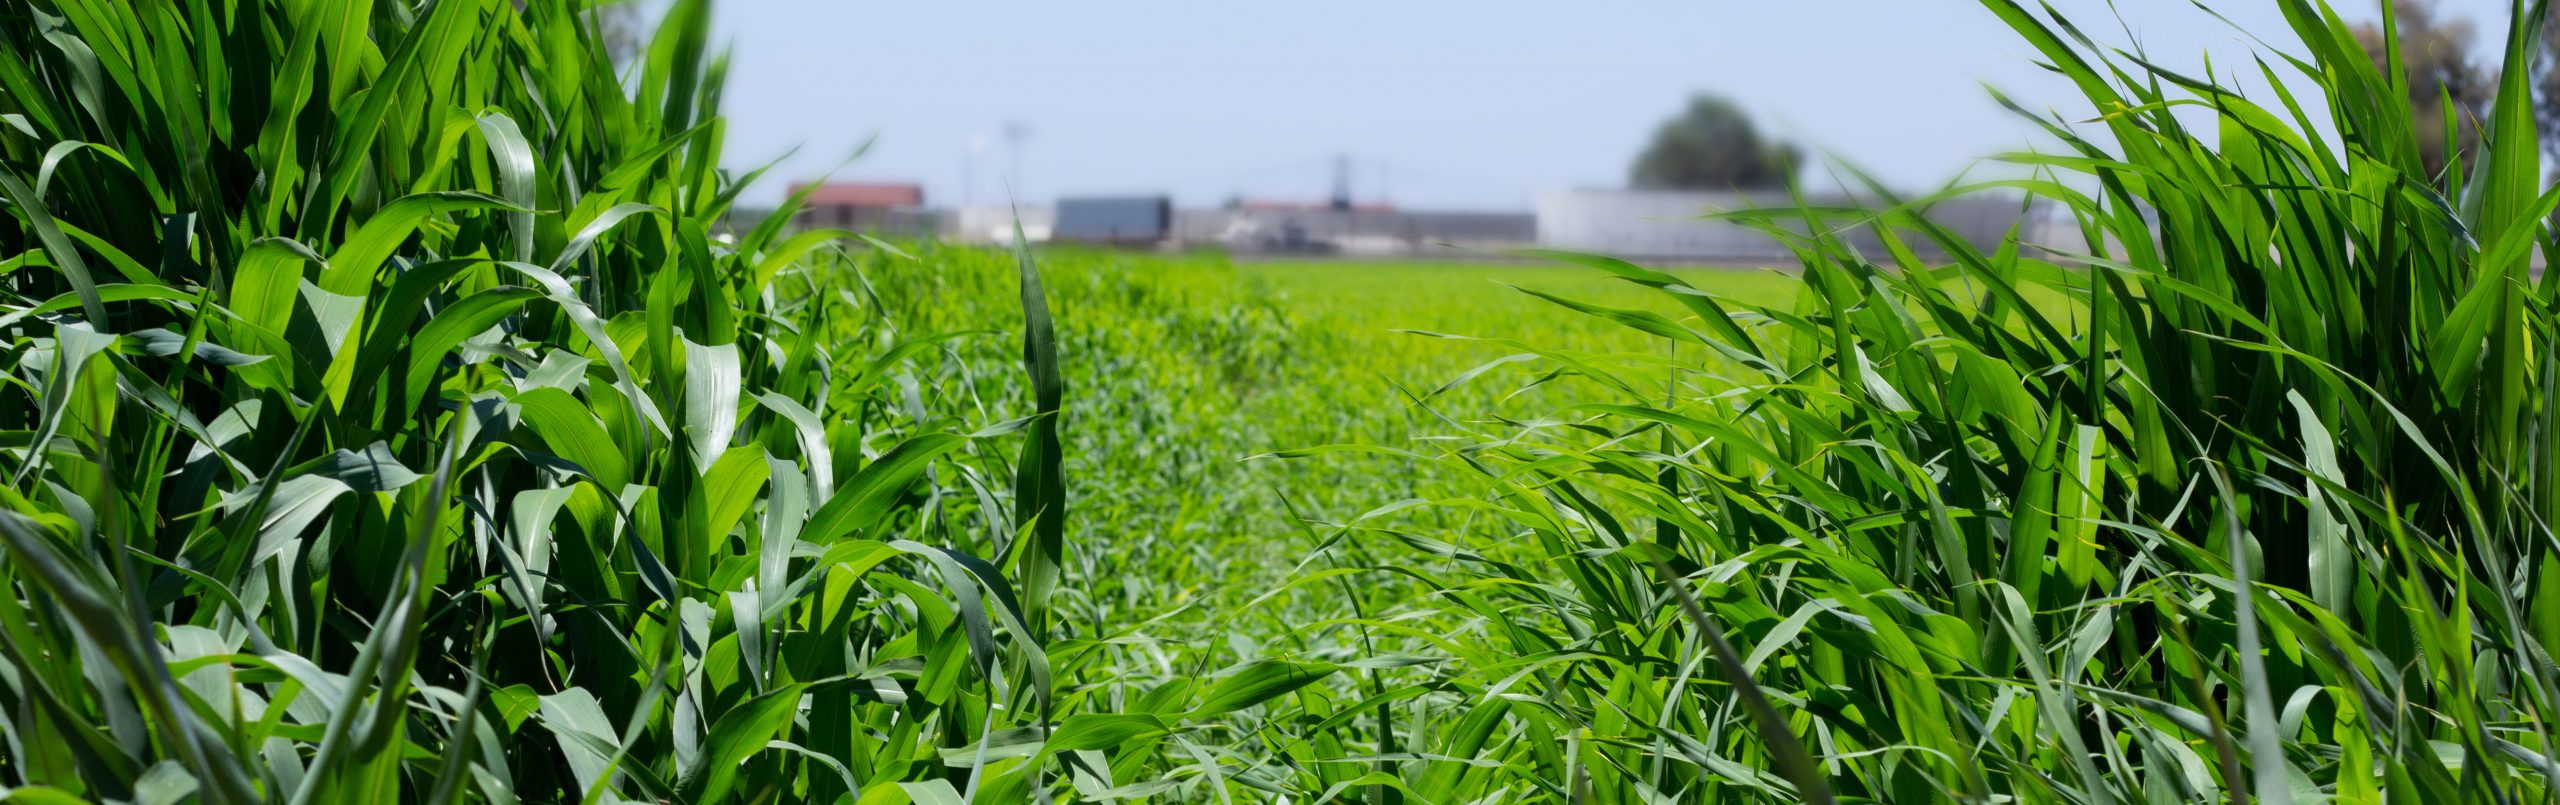 Ag Field Alfalfa